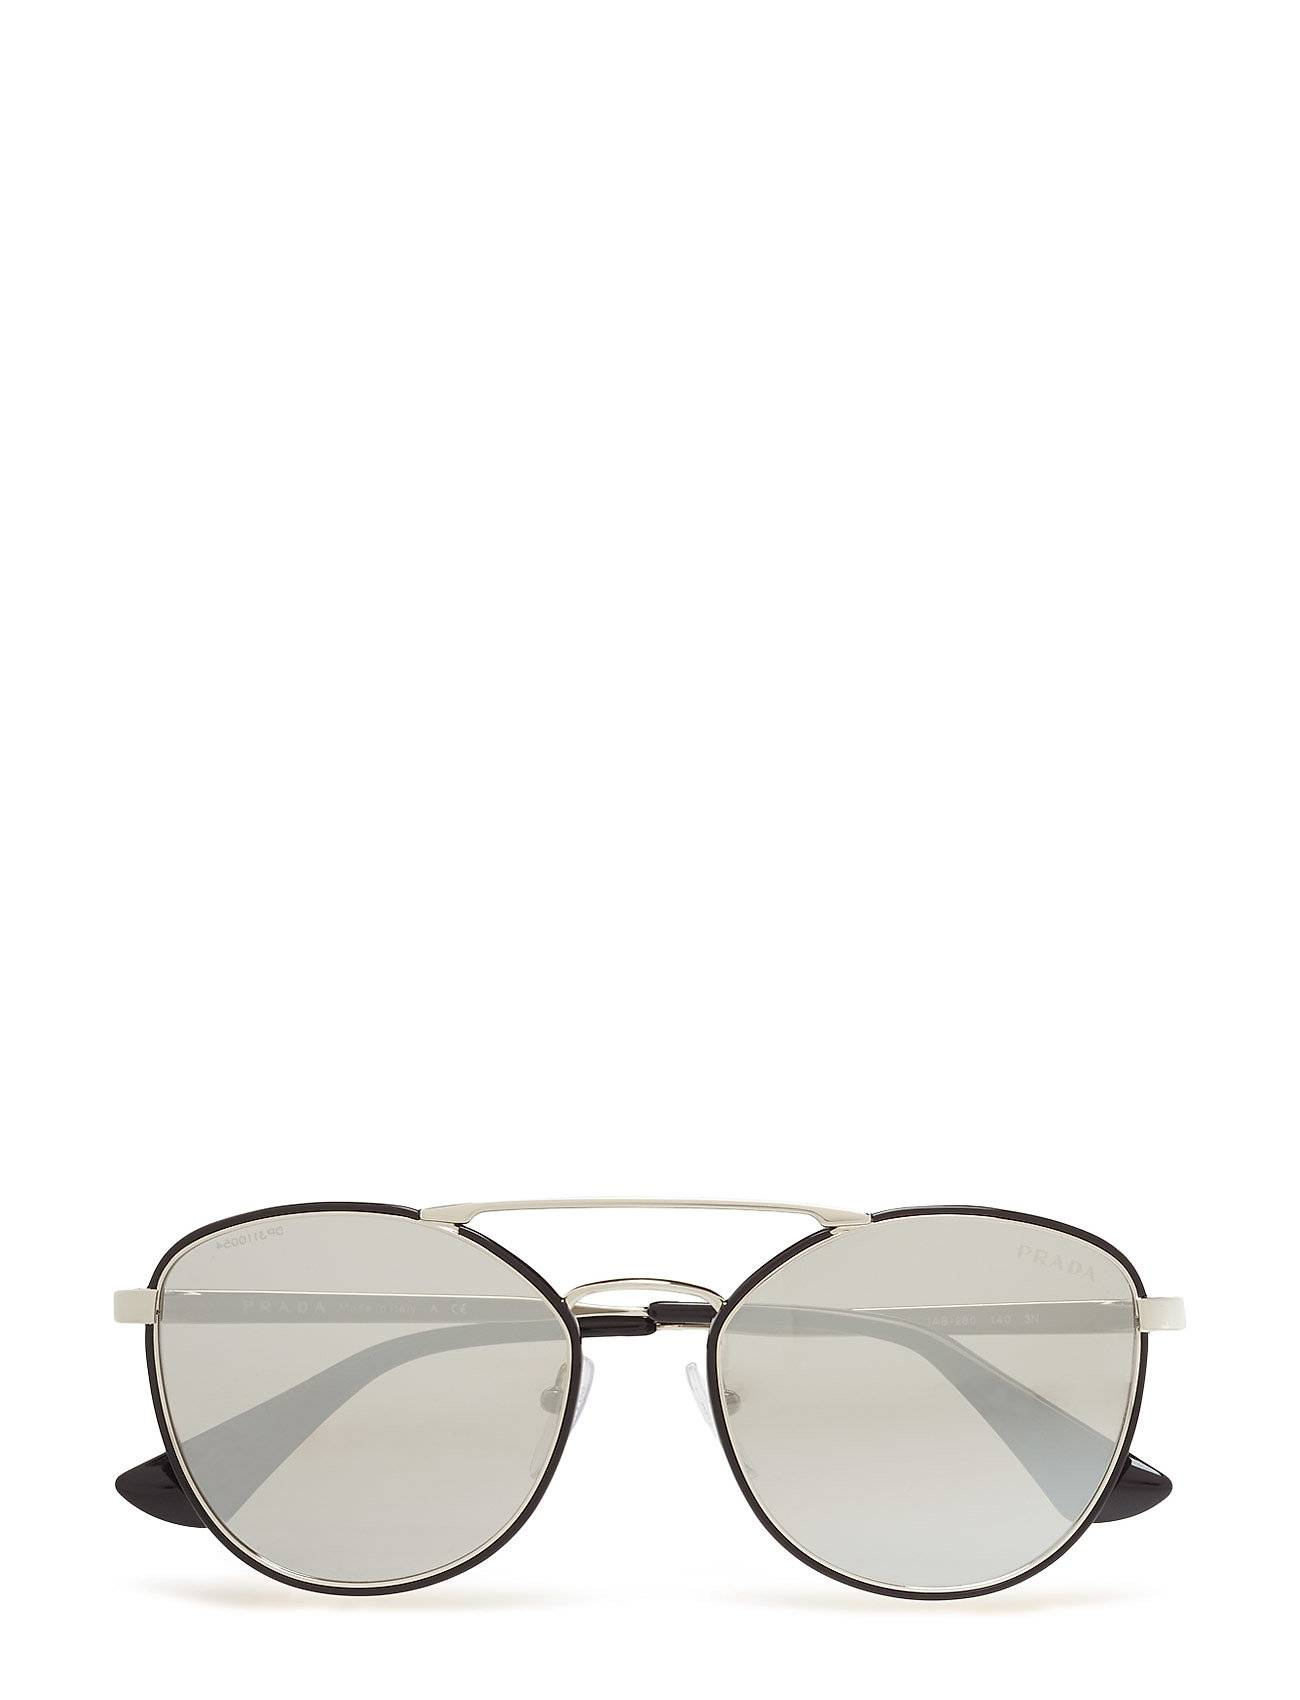 Image of Prada Sunglasses Not Defined Aurinkolasit Musta Prada Sunglasses